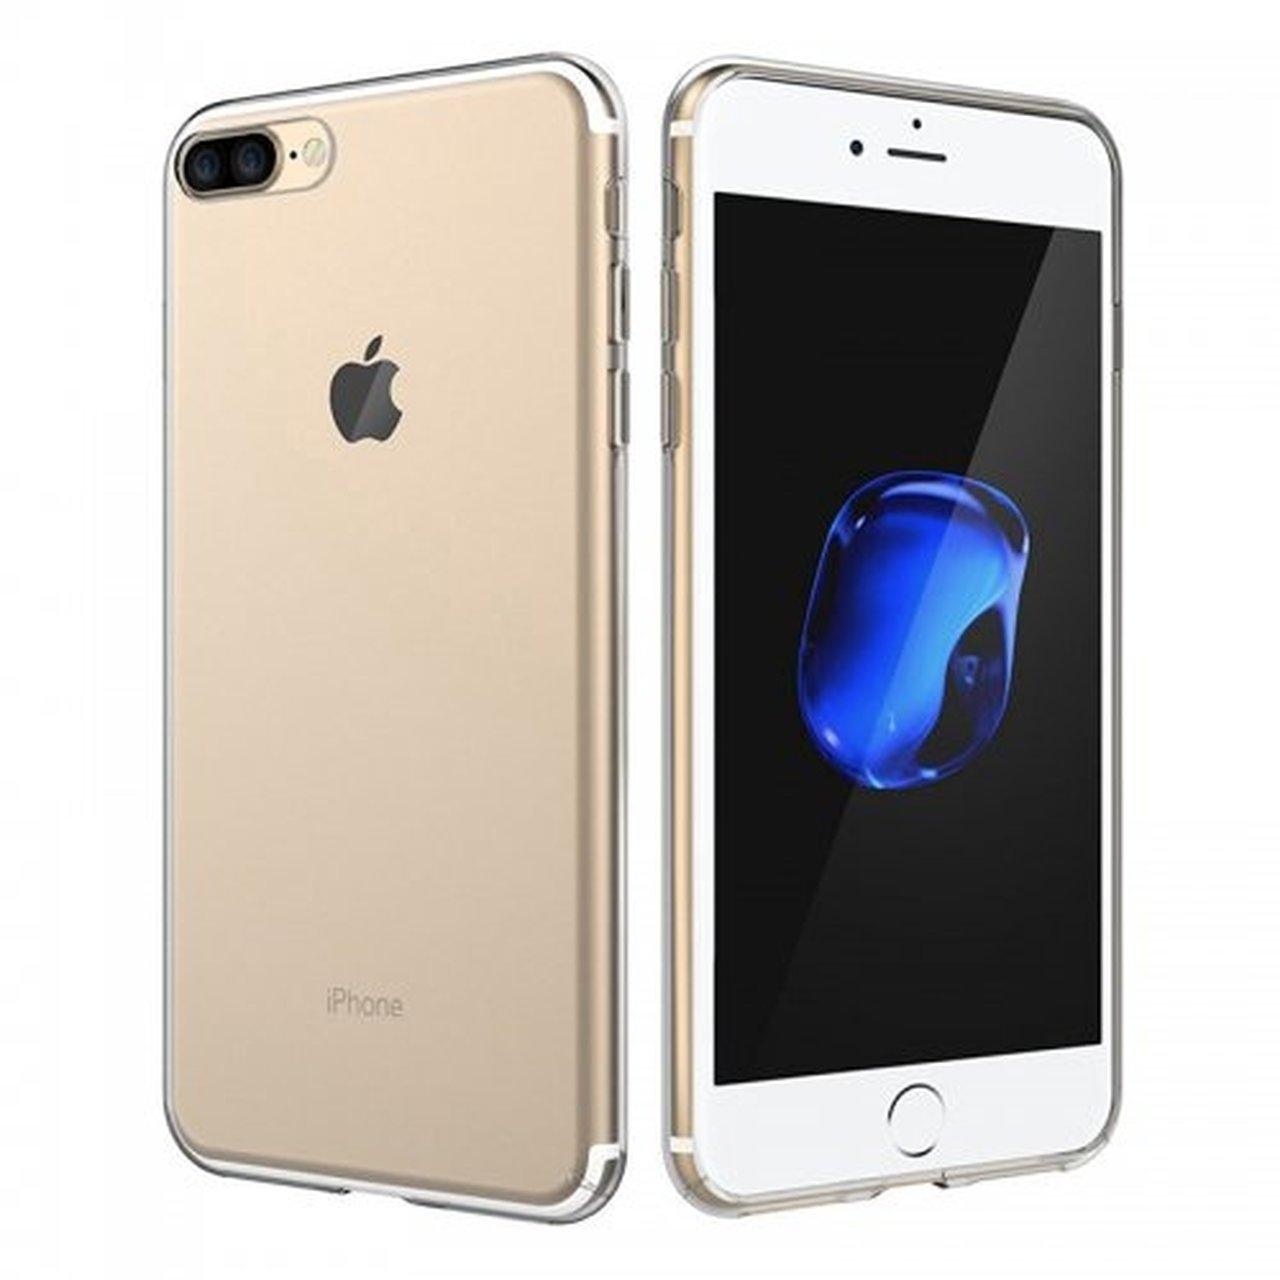 Celly Θήκη Σιλικόνης iPhone 7 Plus / 8 Plus - Transparent (GELSKIN801)